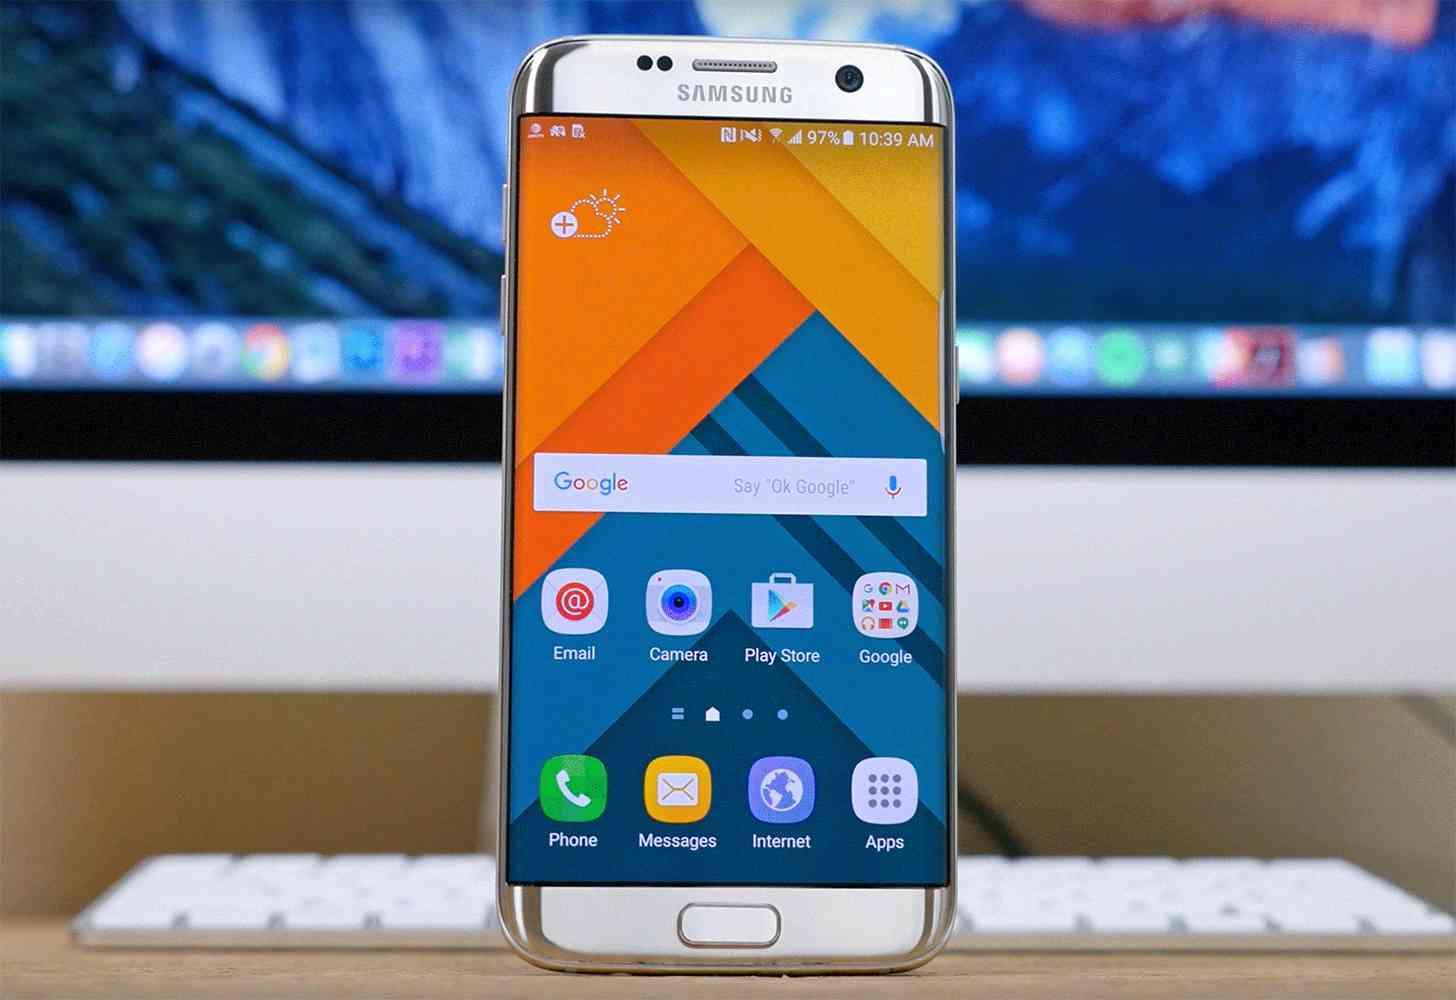 Samsung Galaxy S7 edge hands-on large